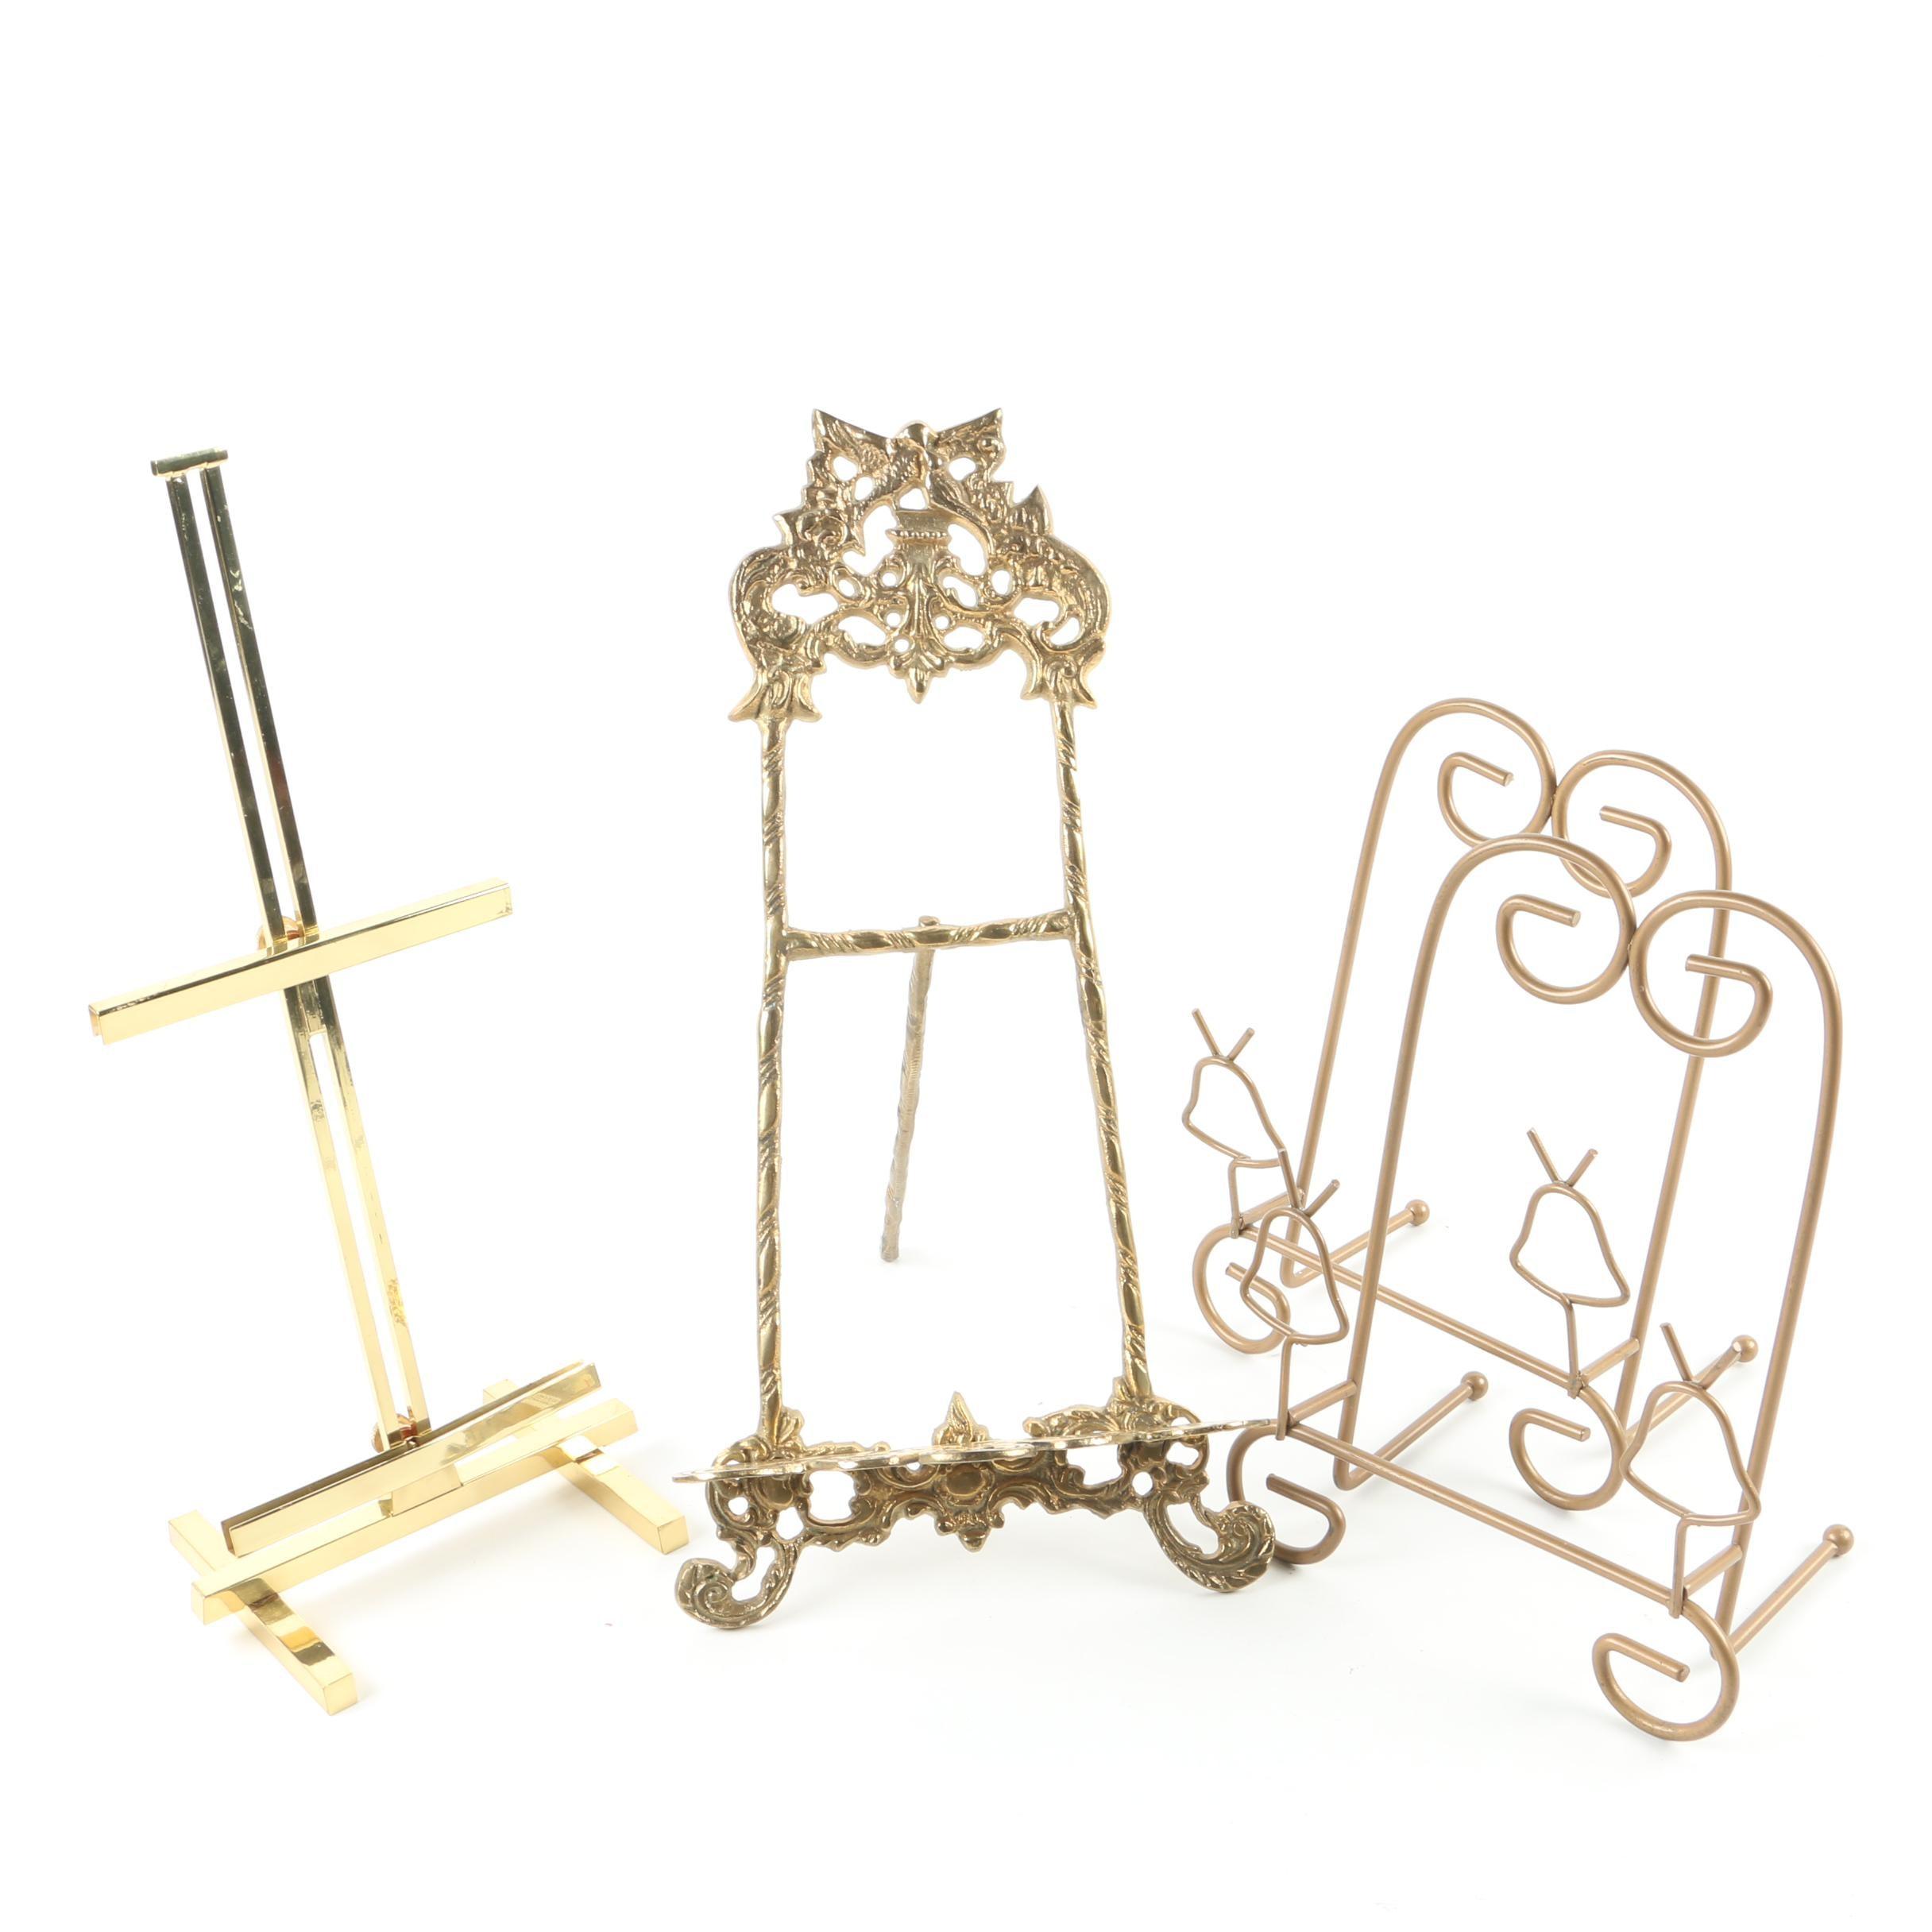 Decorative Brass Stands